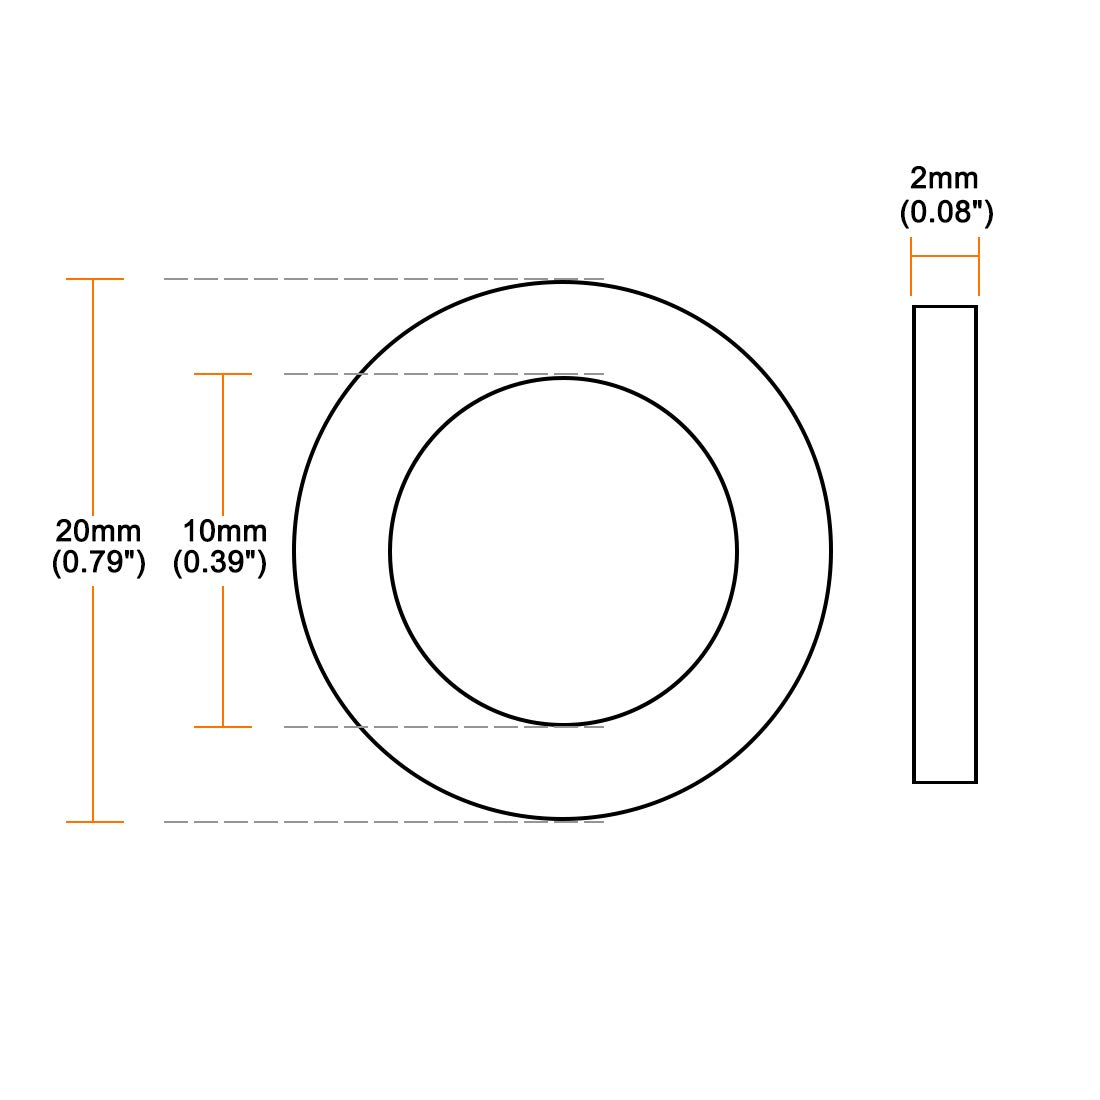 sourcing map Arandelas Planas De Nylon Para Tornillo M4 De 10mm De Di/ámetro Exterior 1mm De Grosor 50Pcs